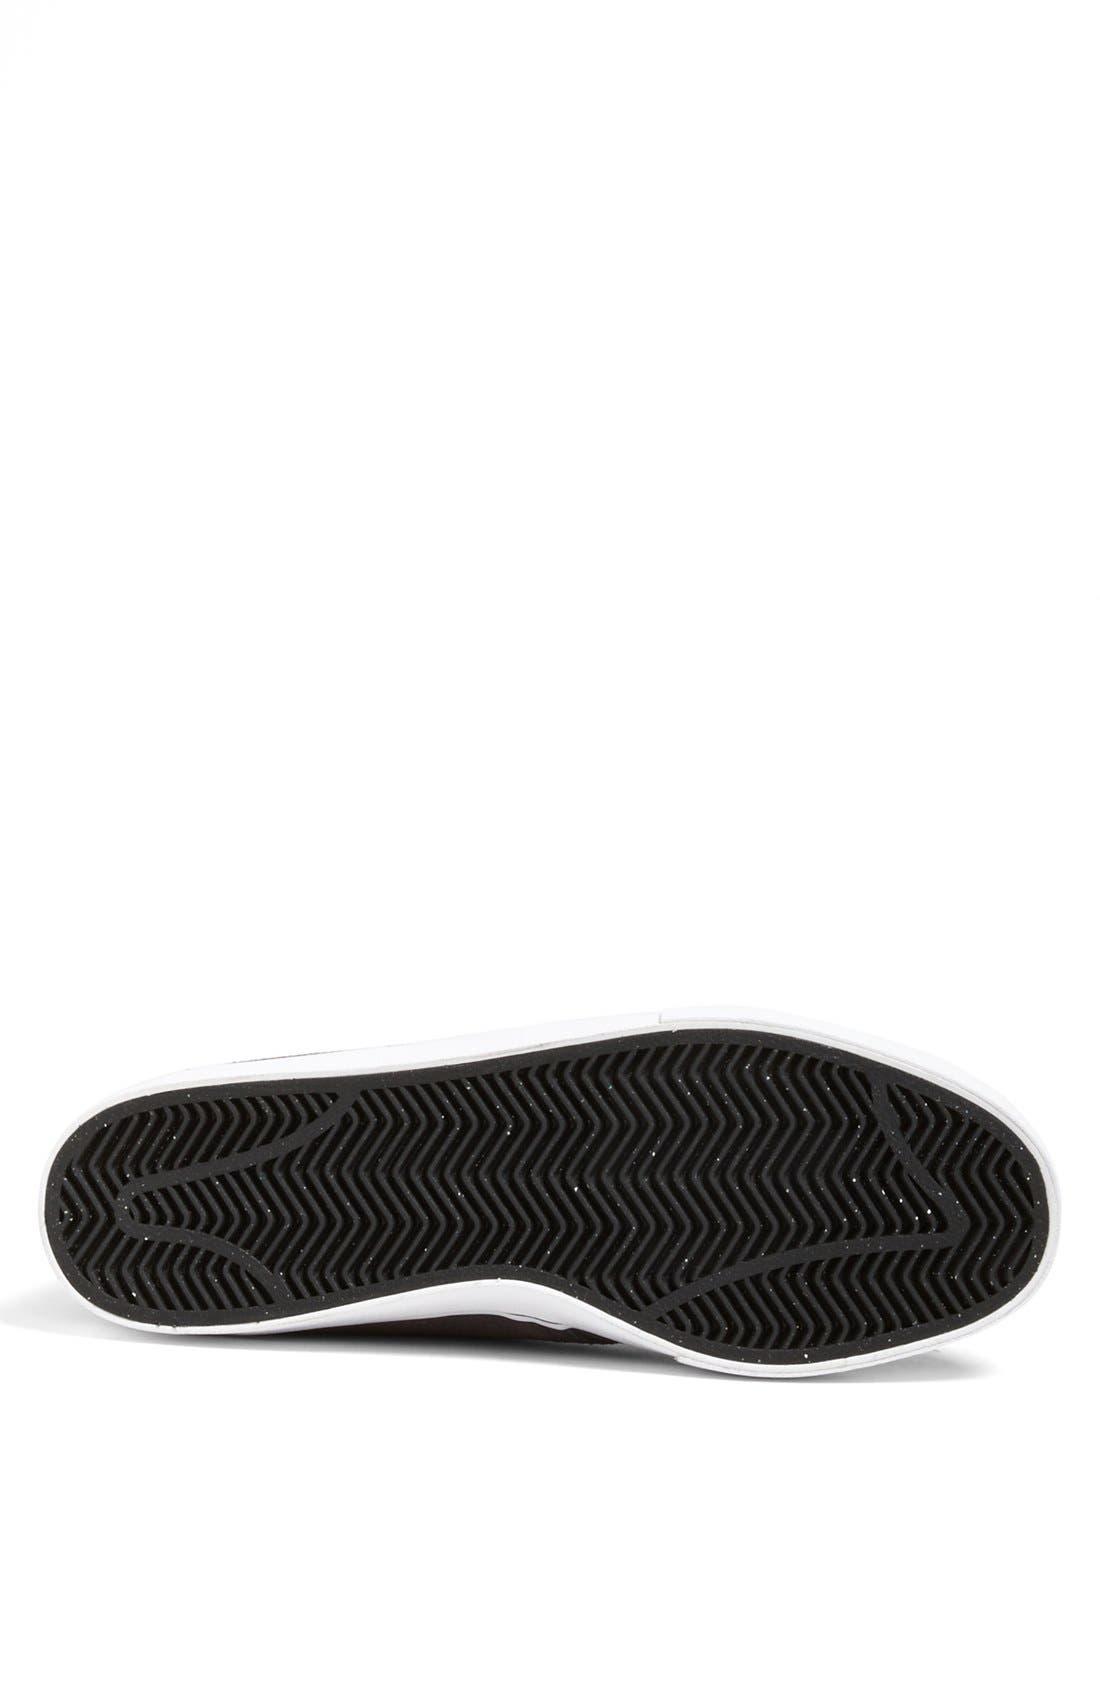 Alternate Image 4  - Nike 'Braata LR' Sneaker (Men)